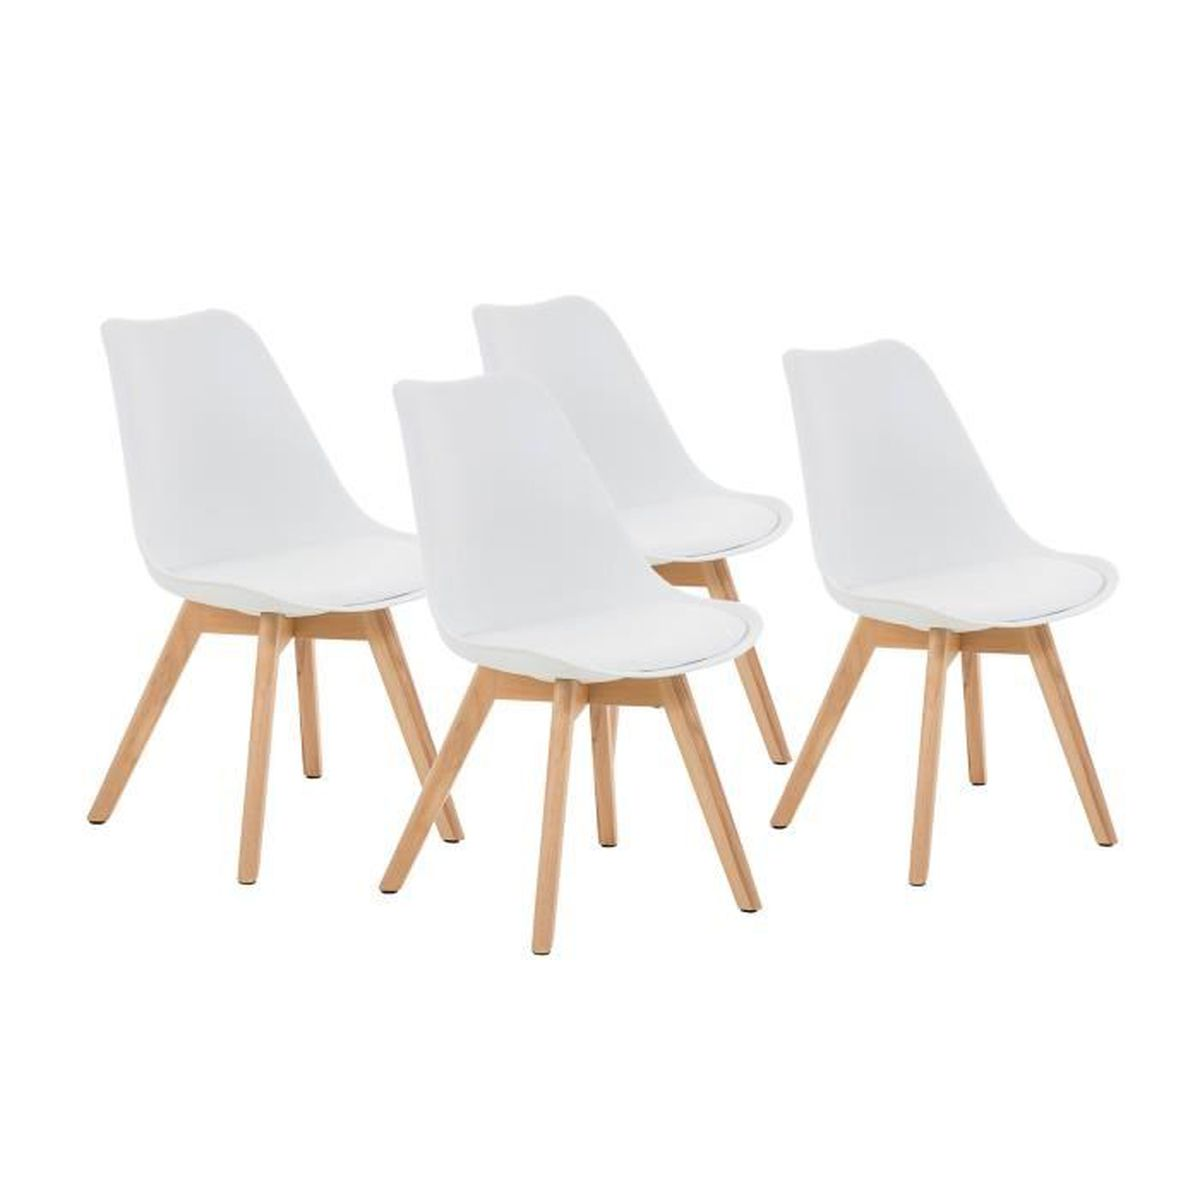 malm lot de 4 chaises design scandinave blanc pu. Black Bedroom Furniture Sets. Home Design Ideas